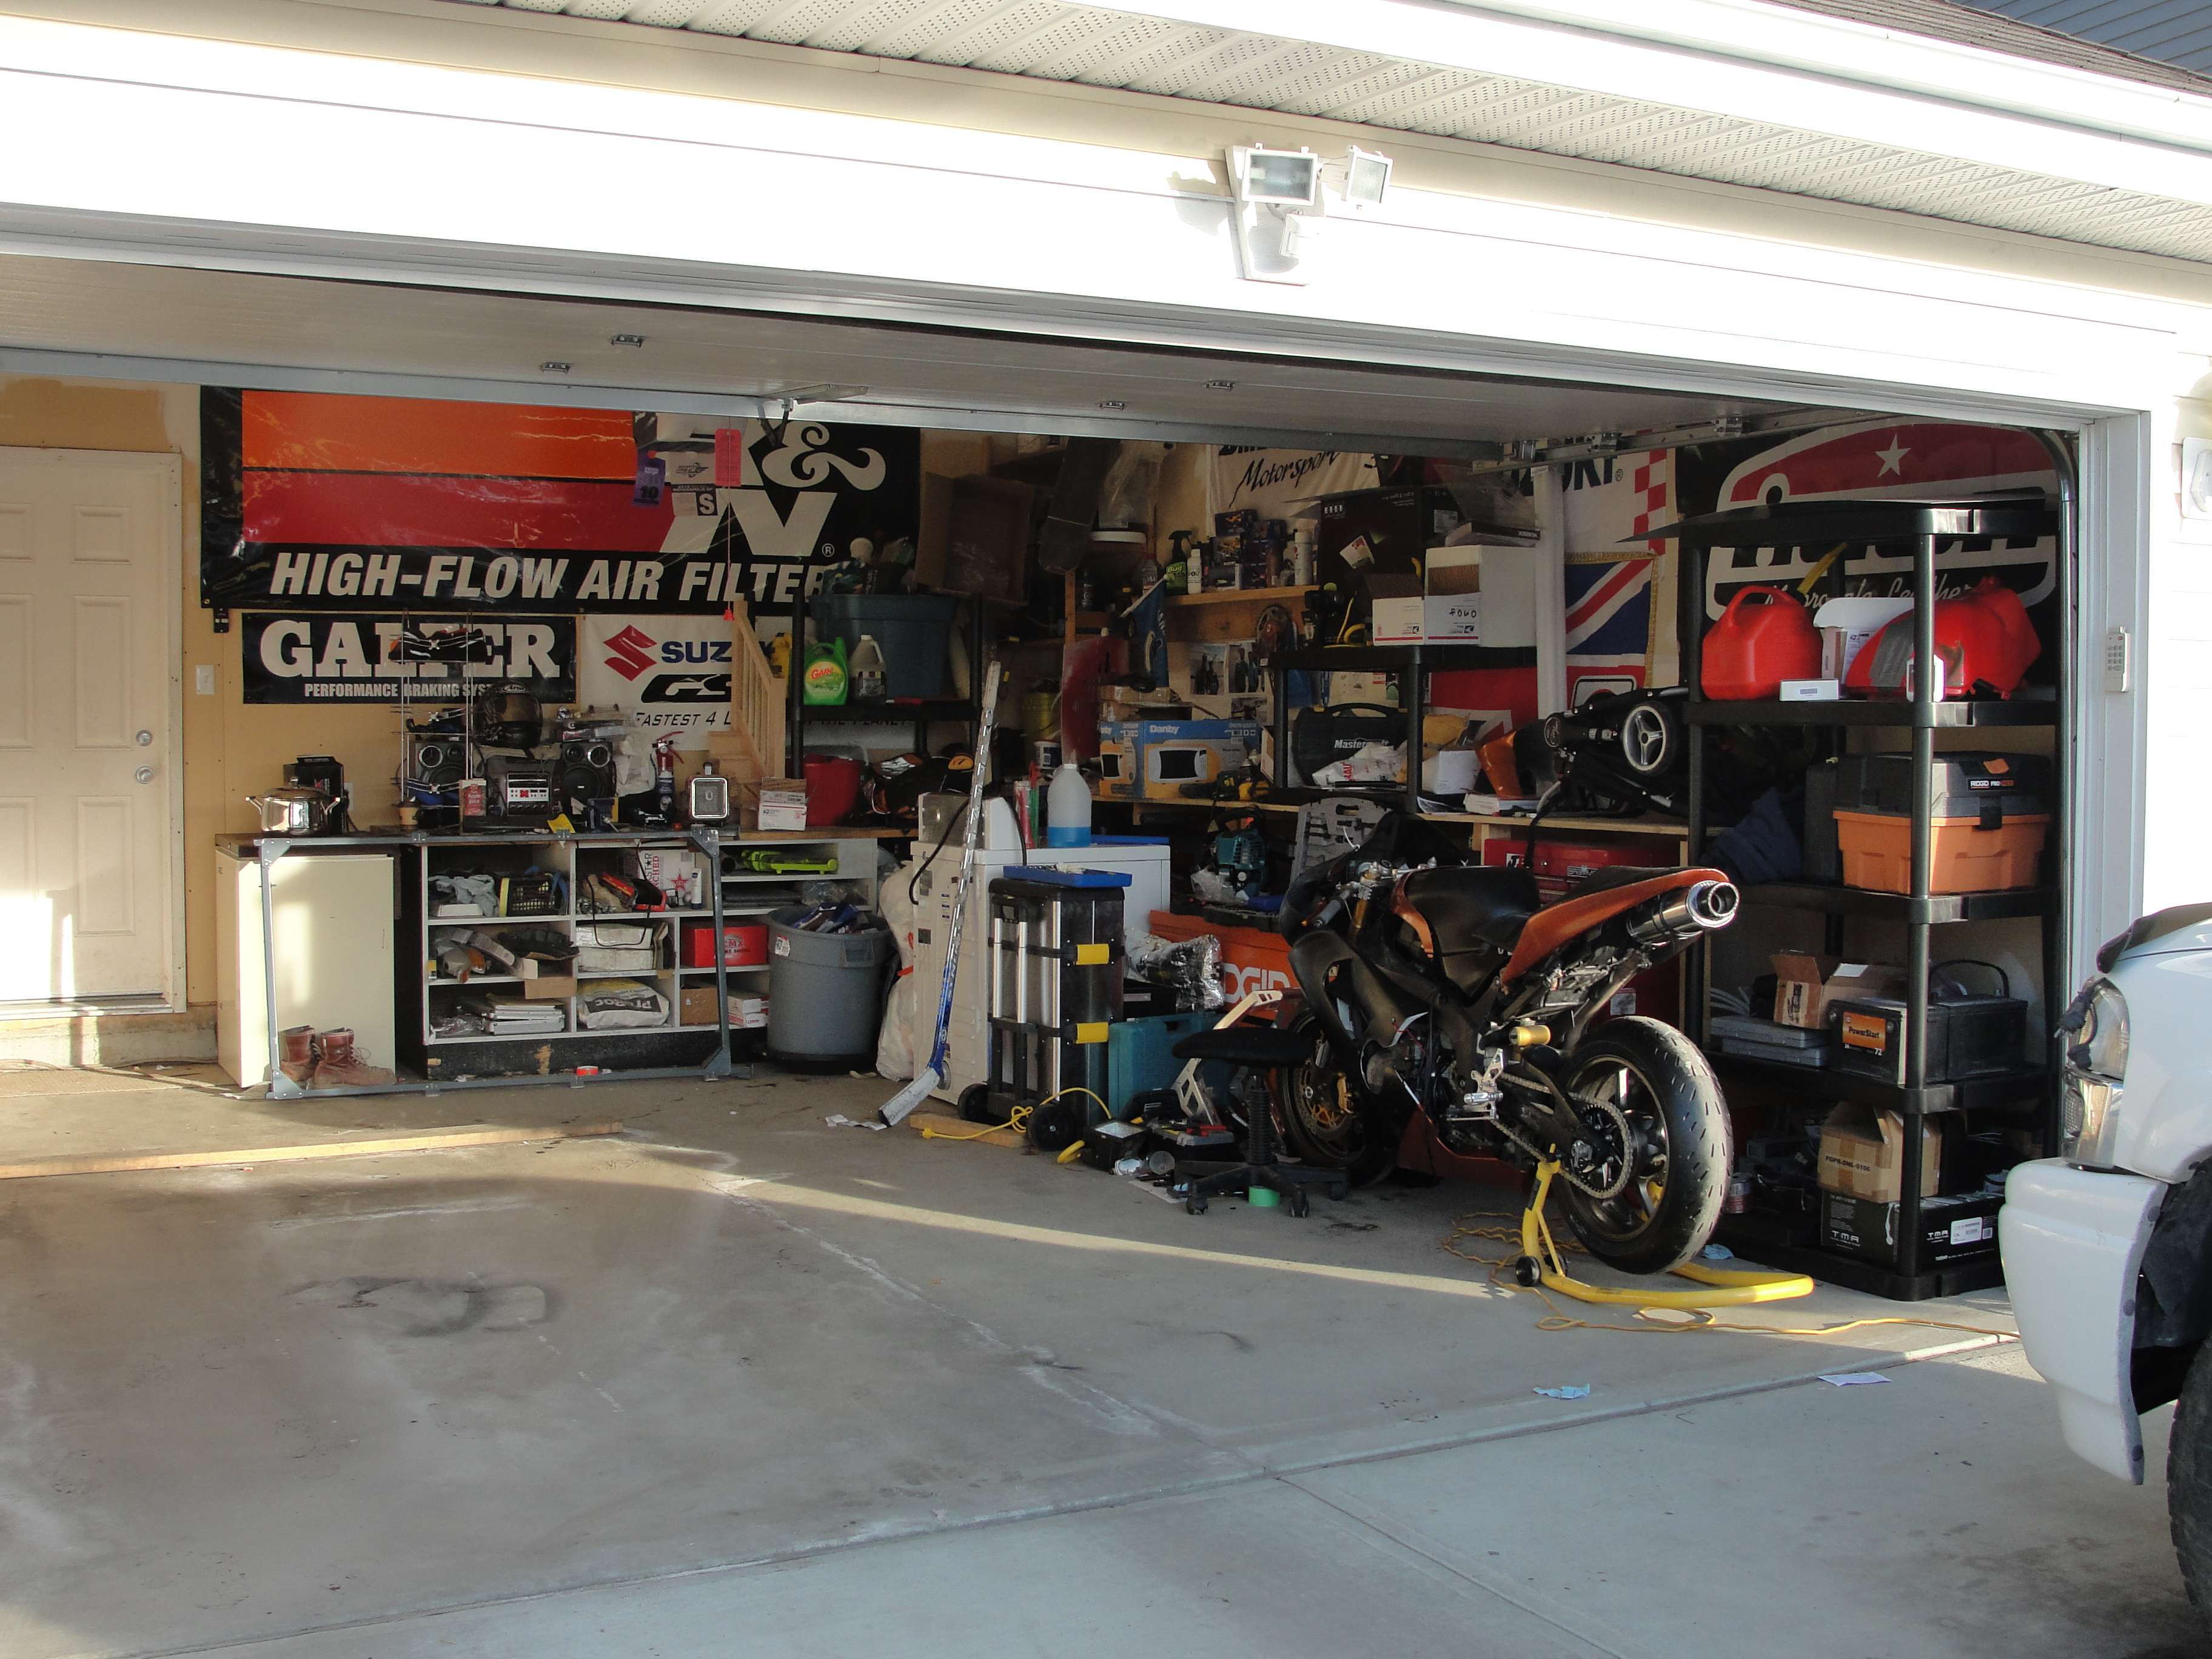 Garage Room post up your bike's garage/shop/room - page 6 - zx6r forum